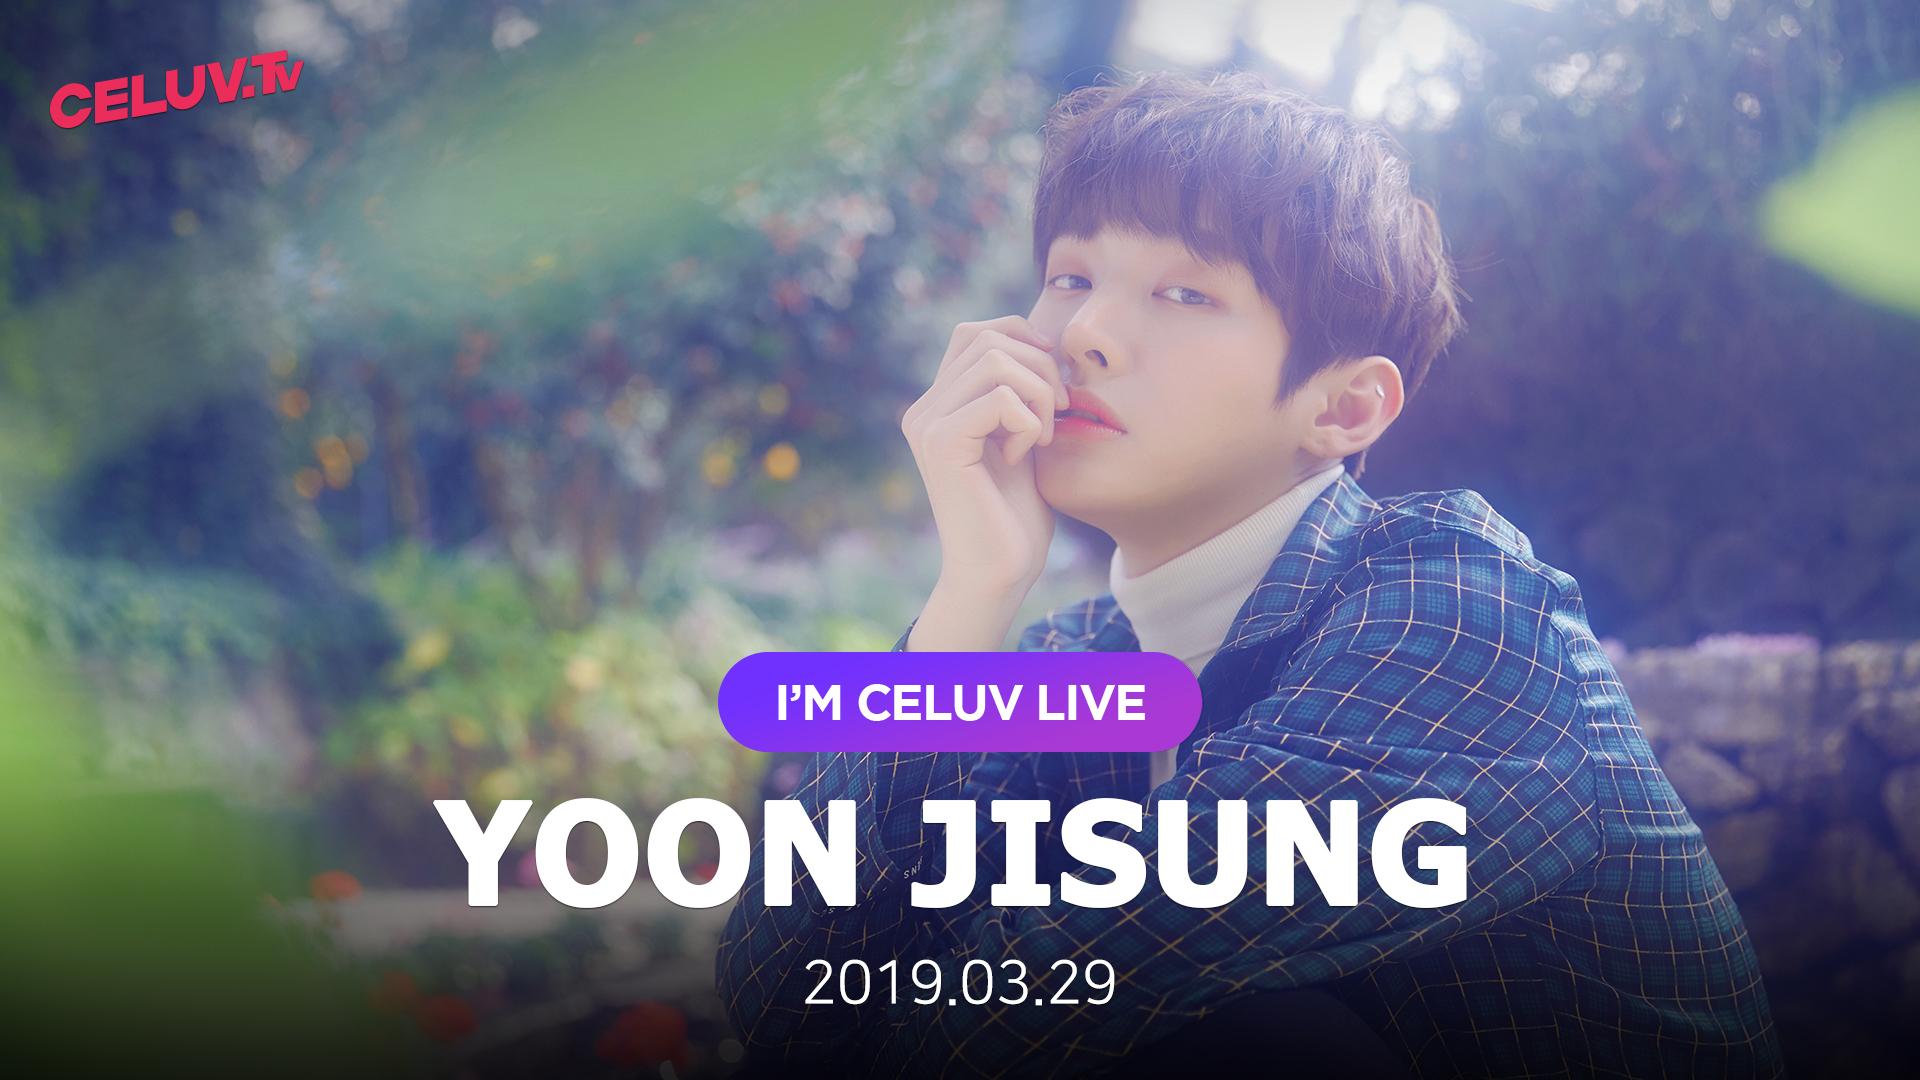 [I'm Celuv] 윤지성(YOON JISUNG), 언제나 항상 네 편이야~ Aside (Celuv.TV)